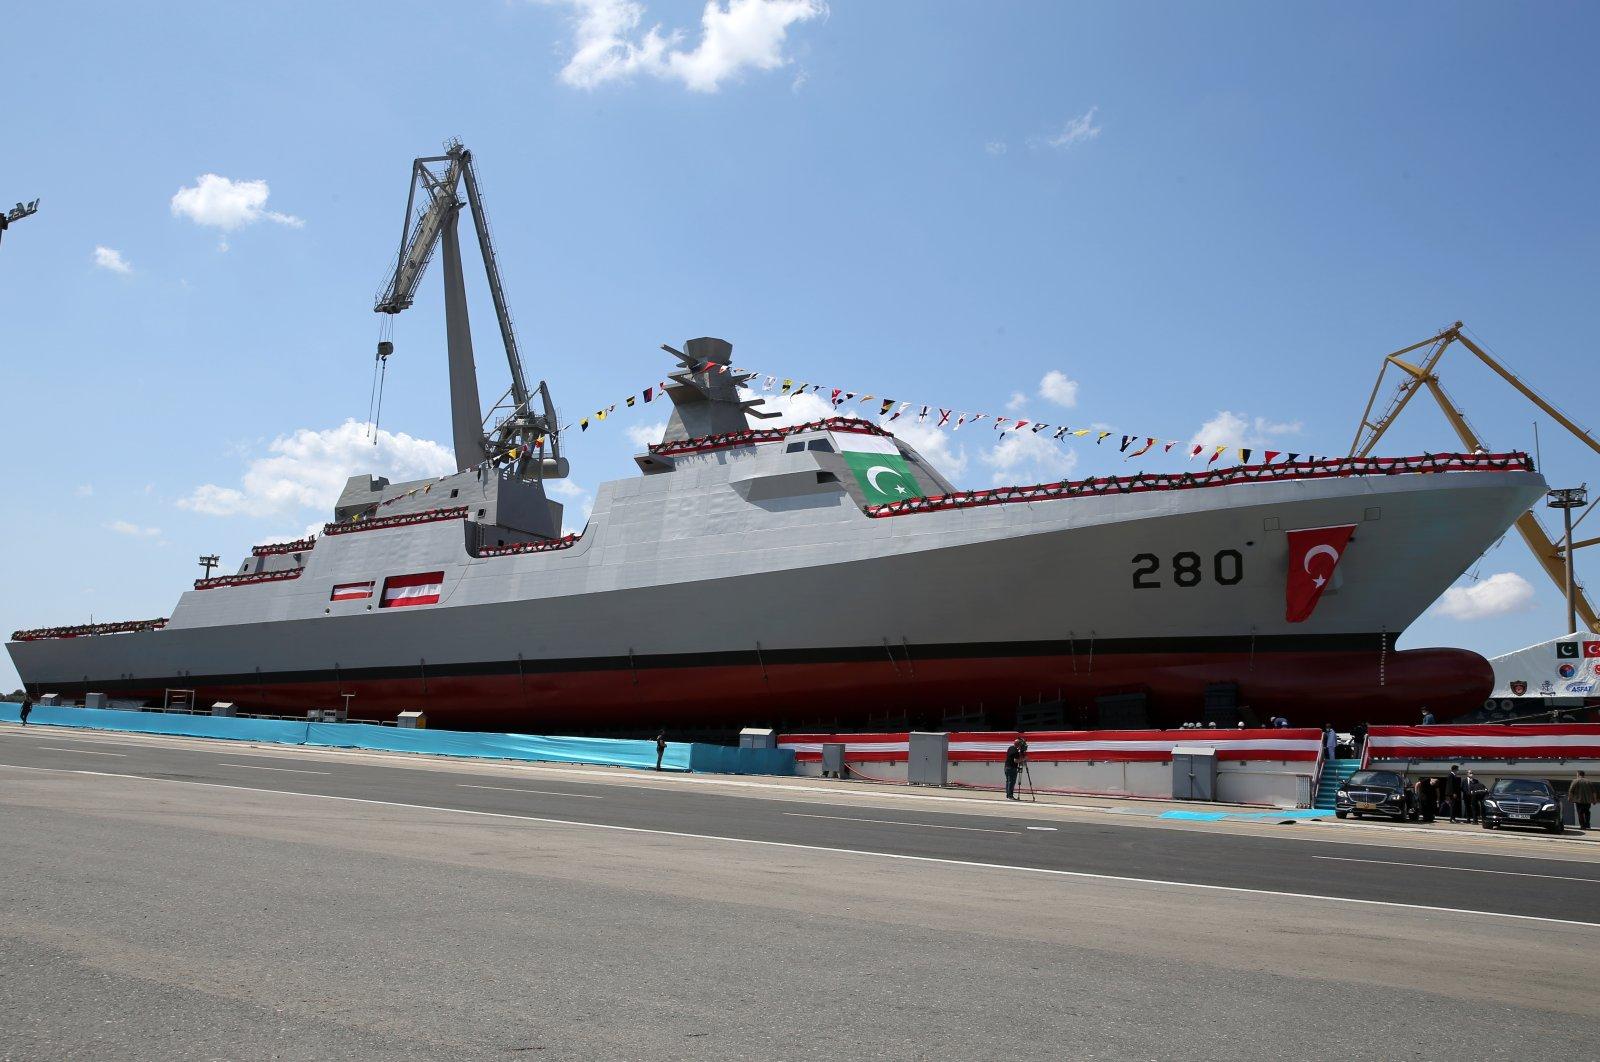 A MILGEM-class corvette built in Turkey for the Pakistan Navy docks in Istanbul, Turkey, Aug. 15, 2021. (AA Photo)